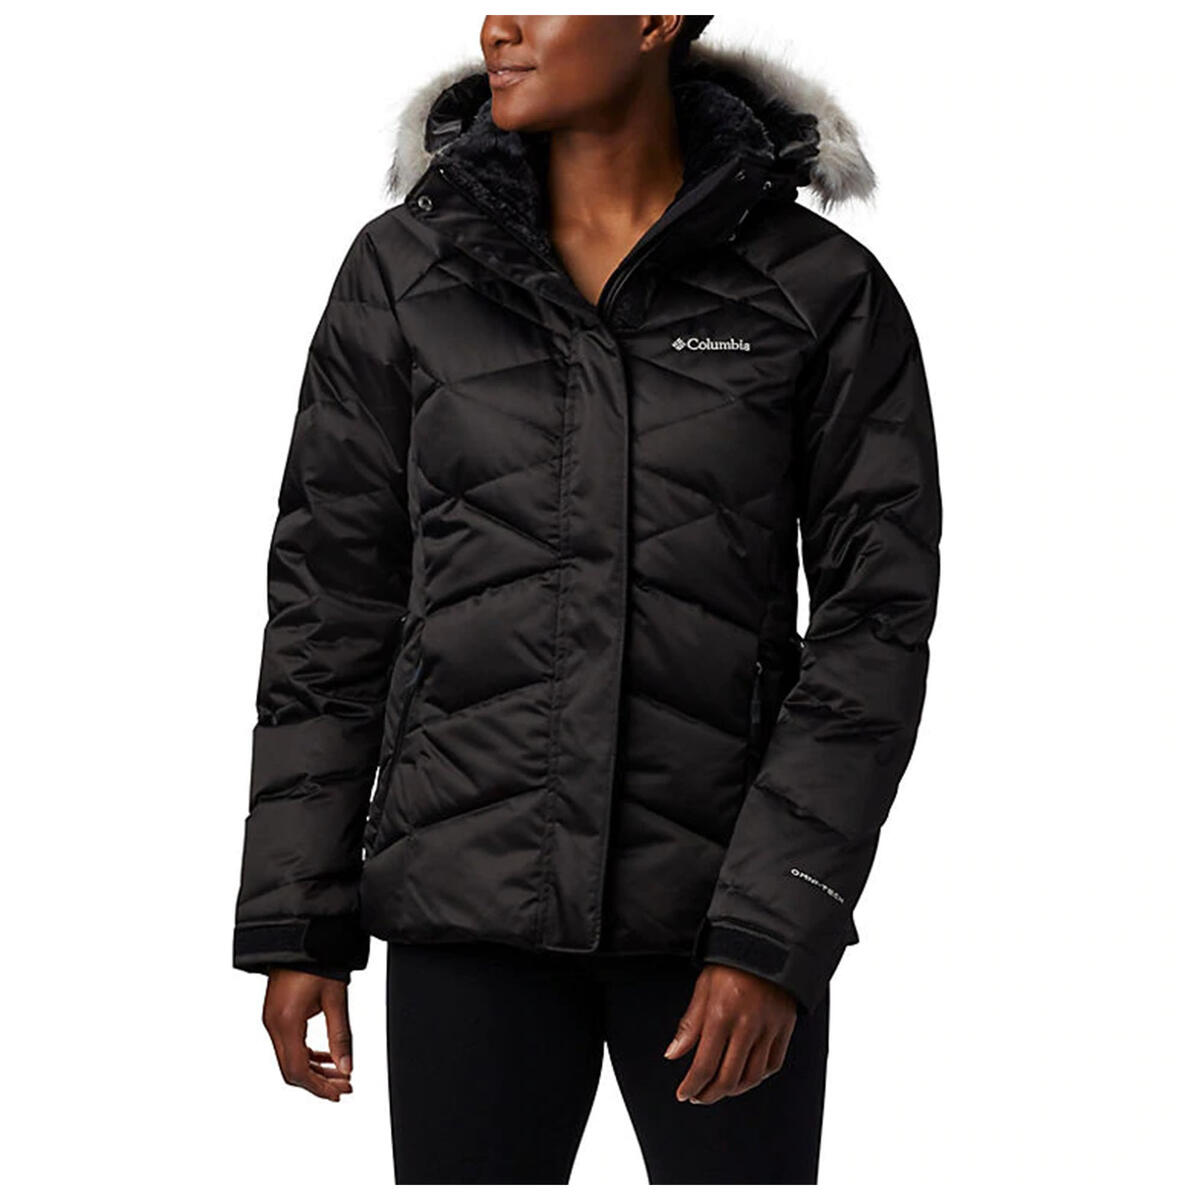 Columbia Women's Lay D Down II Jacket - Sun & Ski Sports